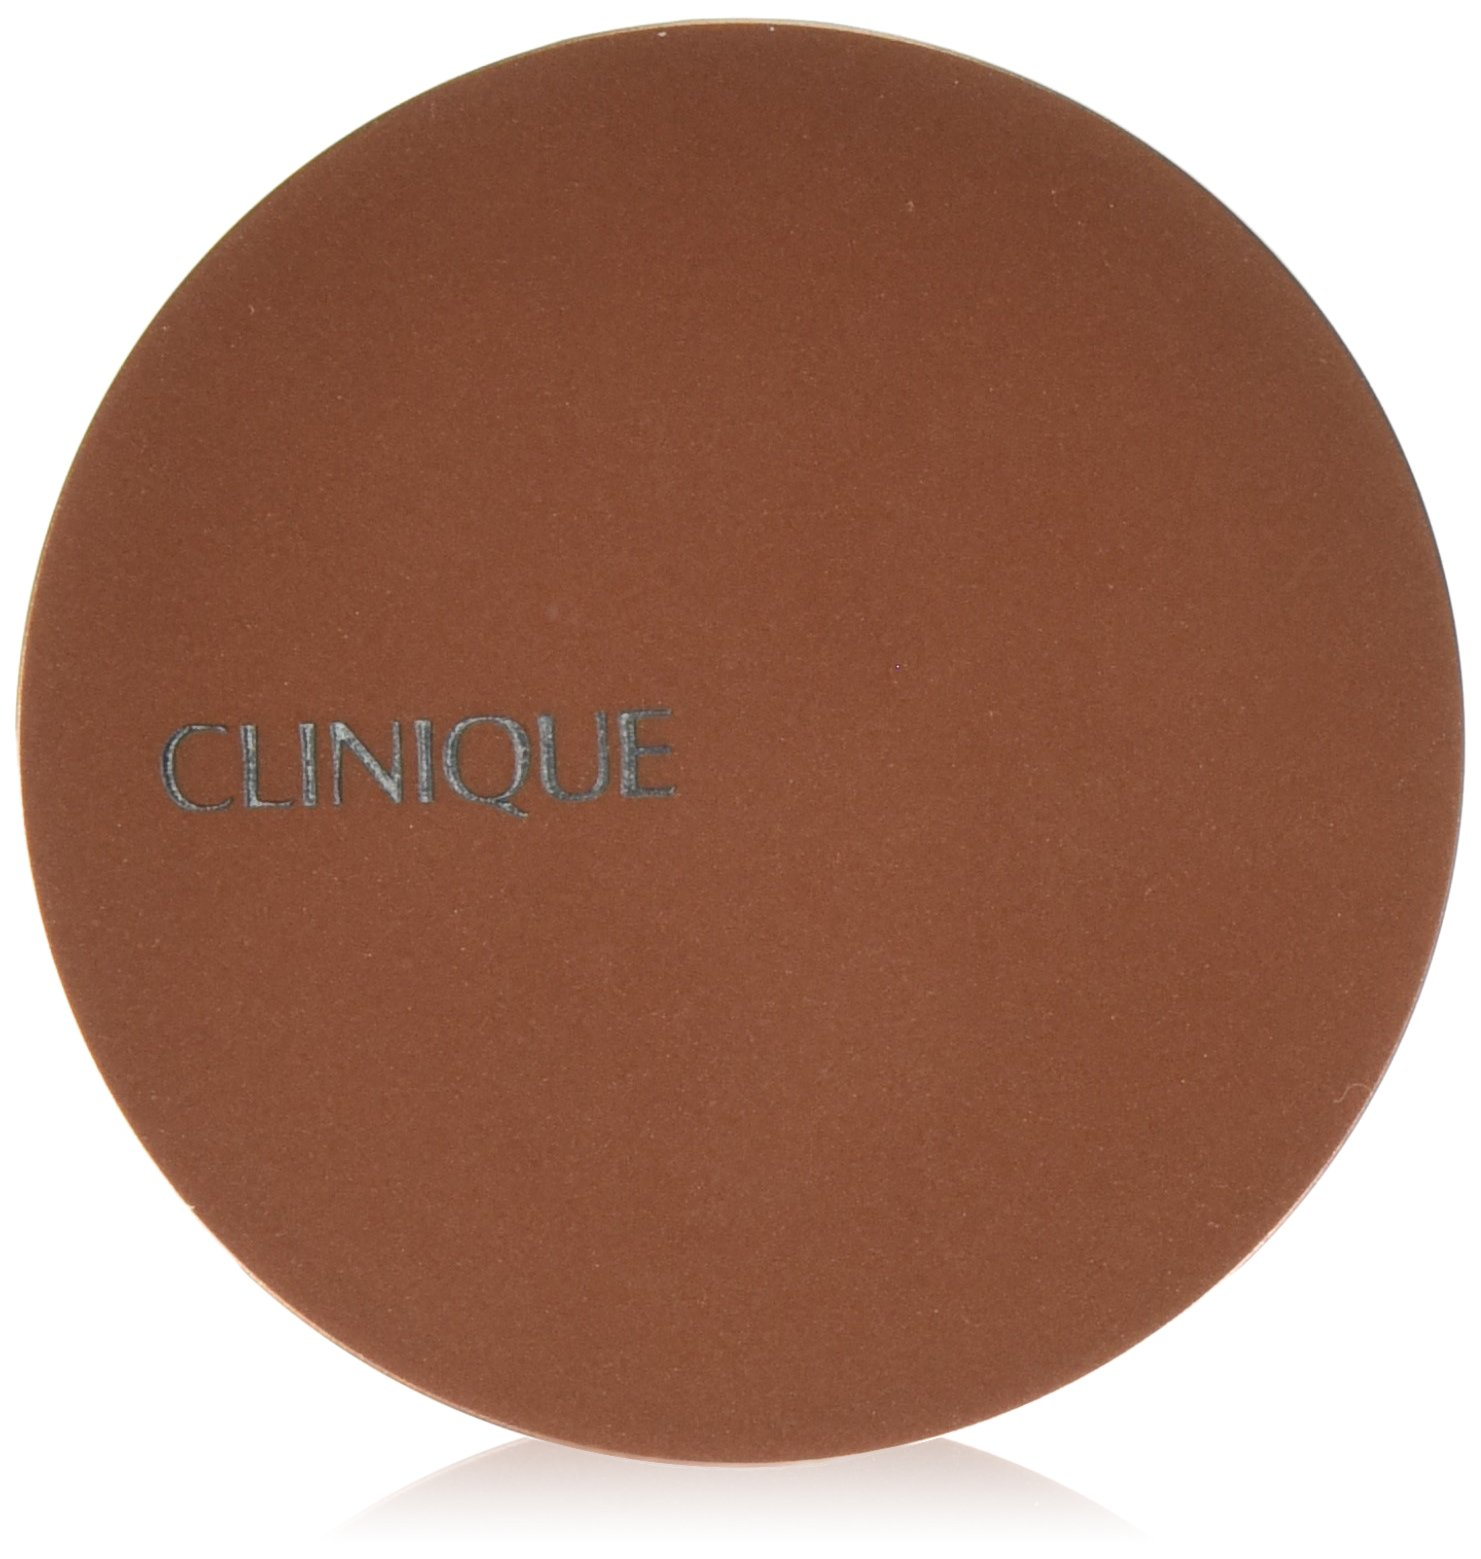 Clinique True Bronze Pressed Powder Bronzer, No. 02 Sunkissed, 0.33 Ounce